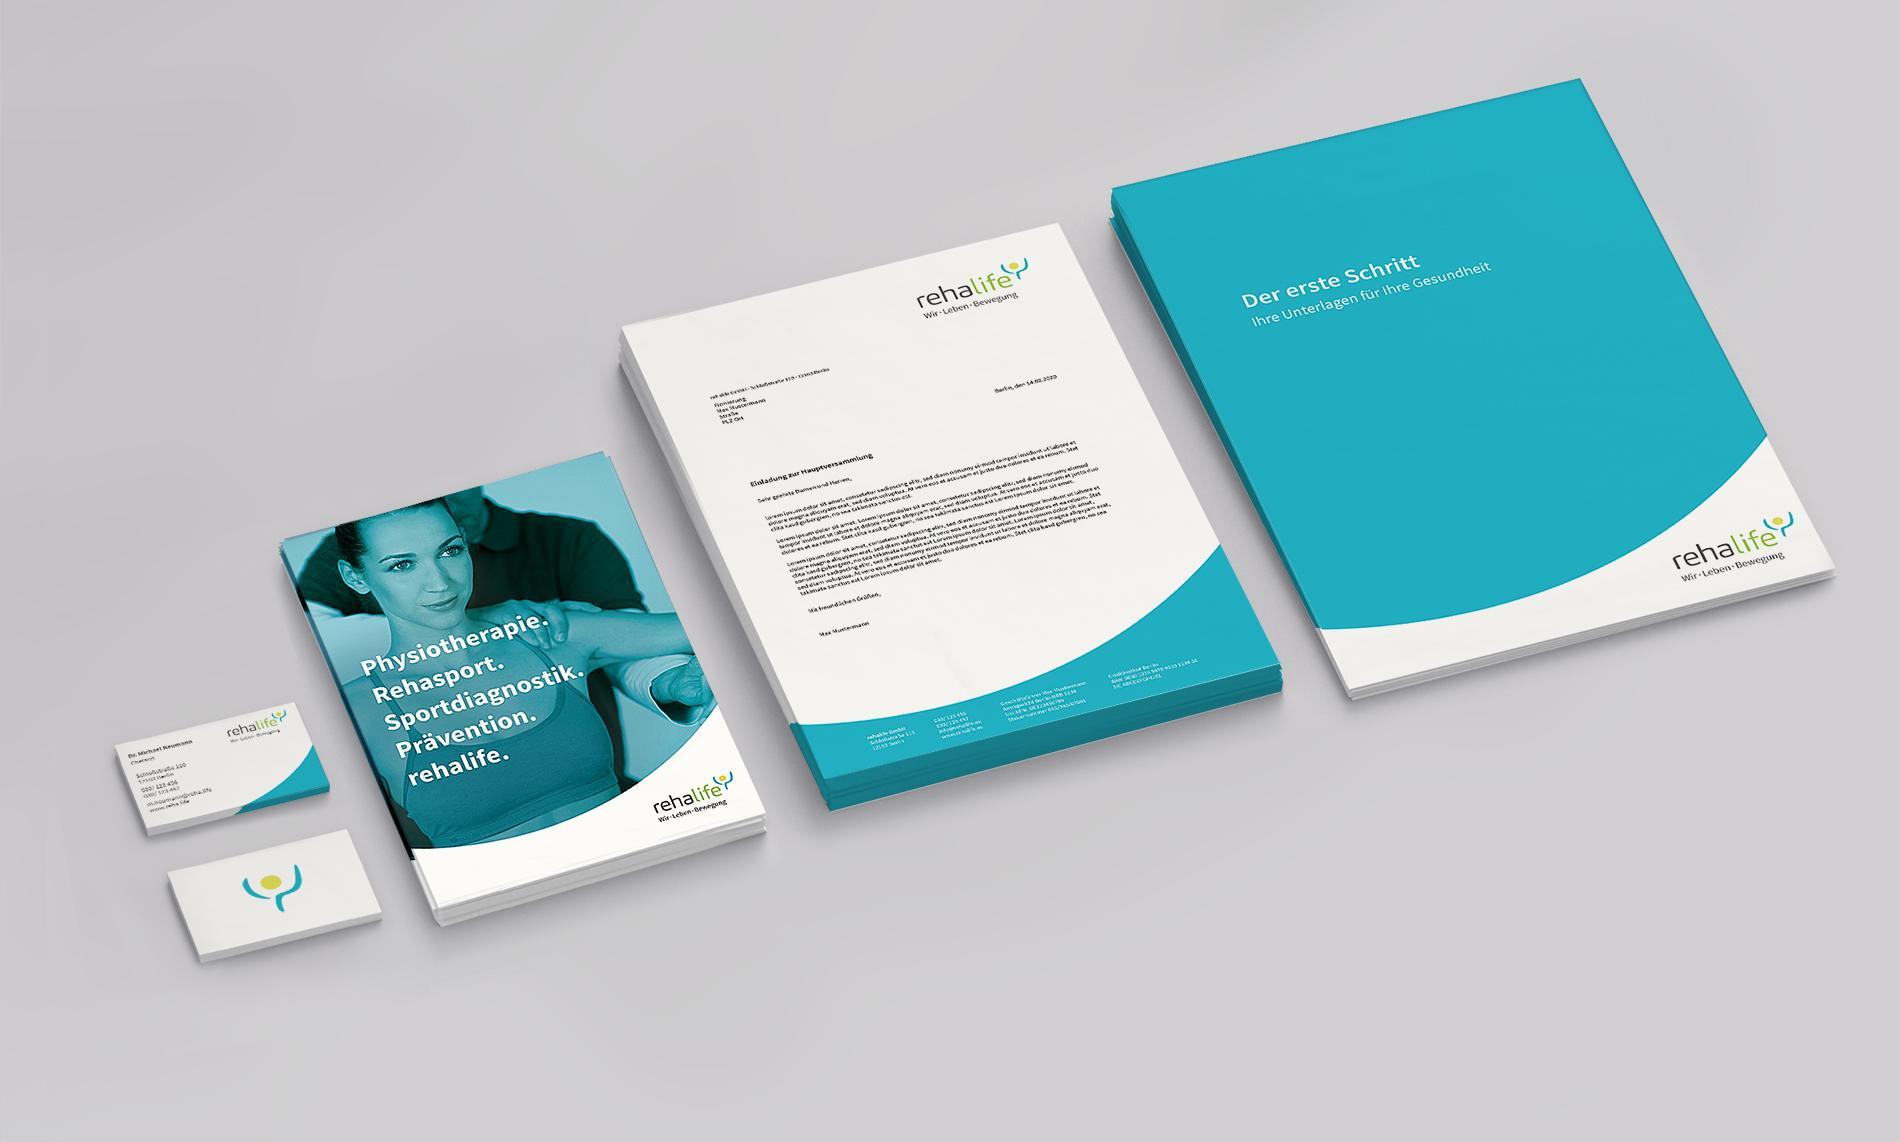 Kuki Design Corporate Design rehalife Gestaltung Geschäftspapier, Flyer, Logogestaltung, Farbgebung, Mockup